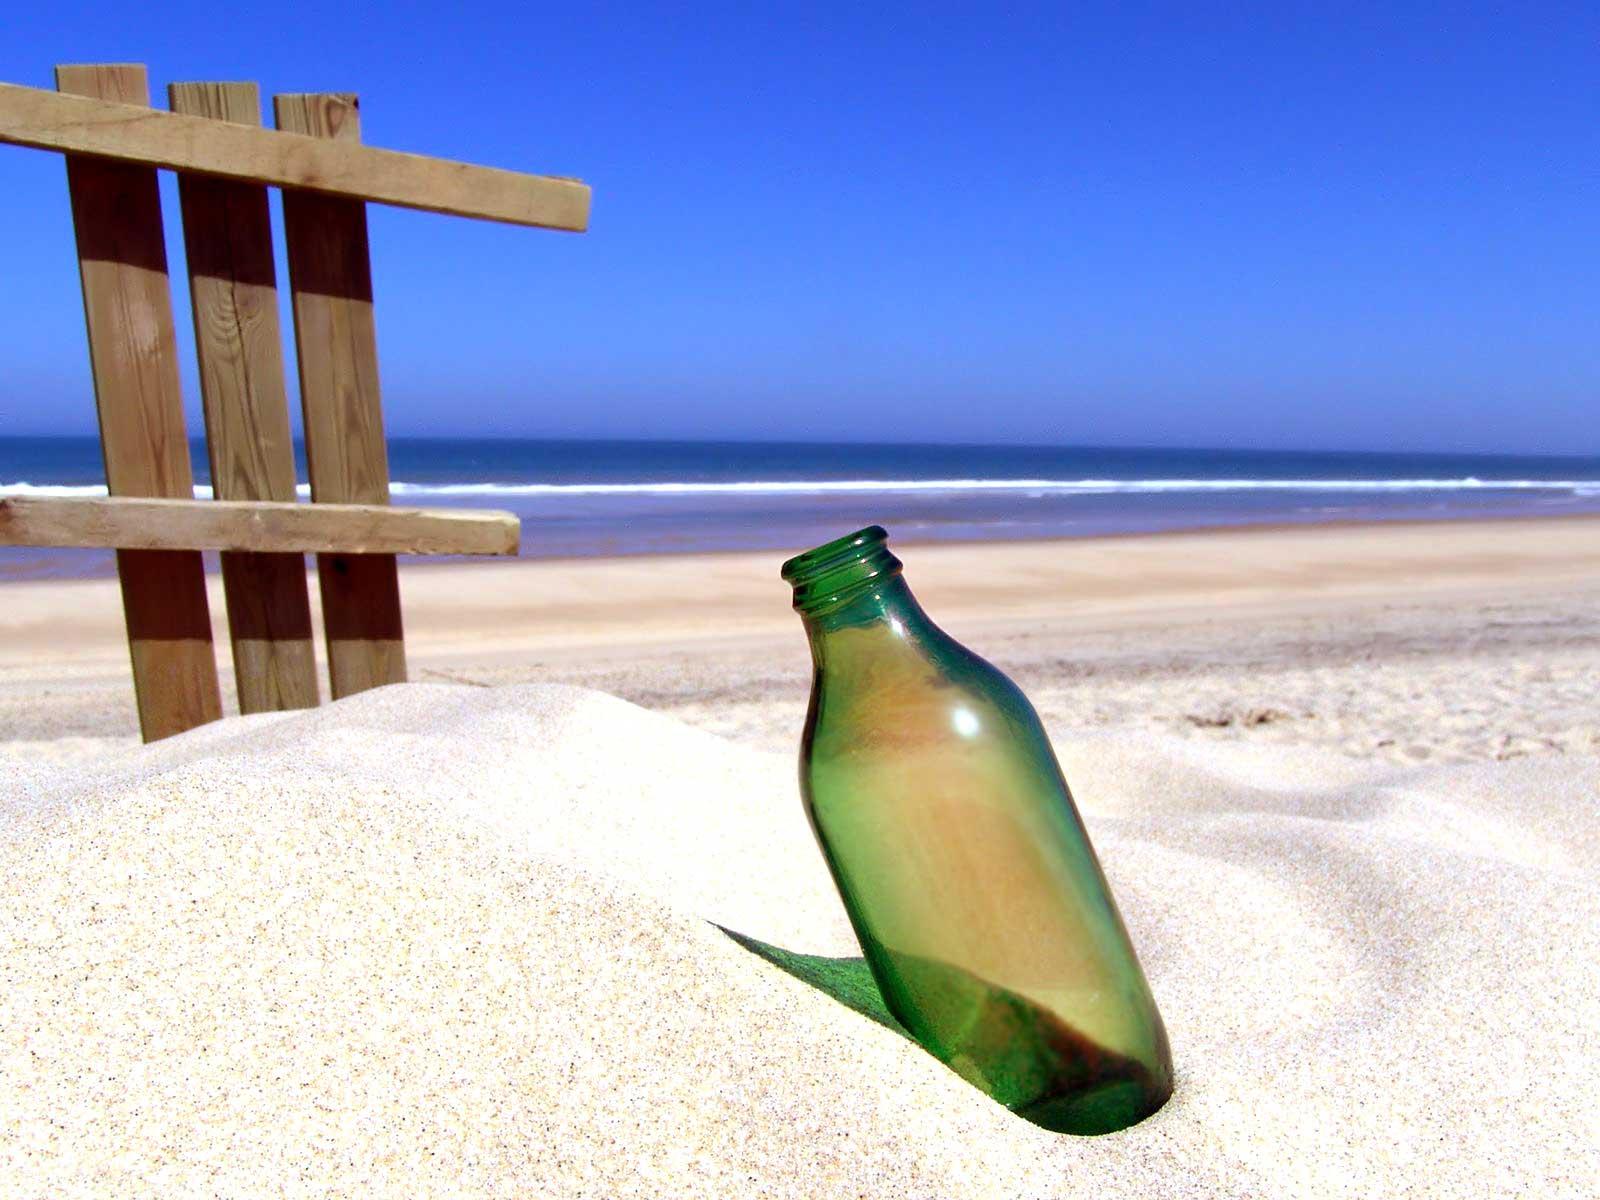 beach wallpaper, bottle, бутылка на пляже на песке, стеклянная бутылка, скачать фото